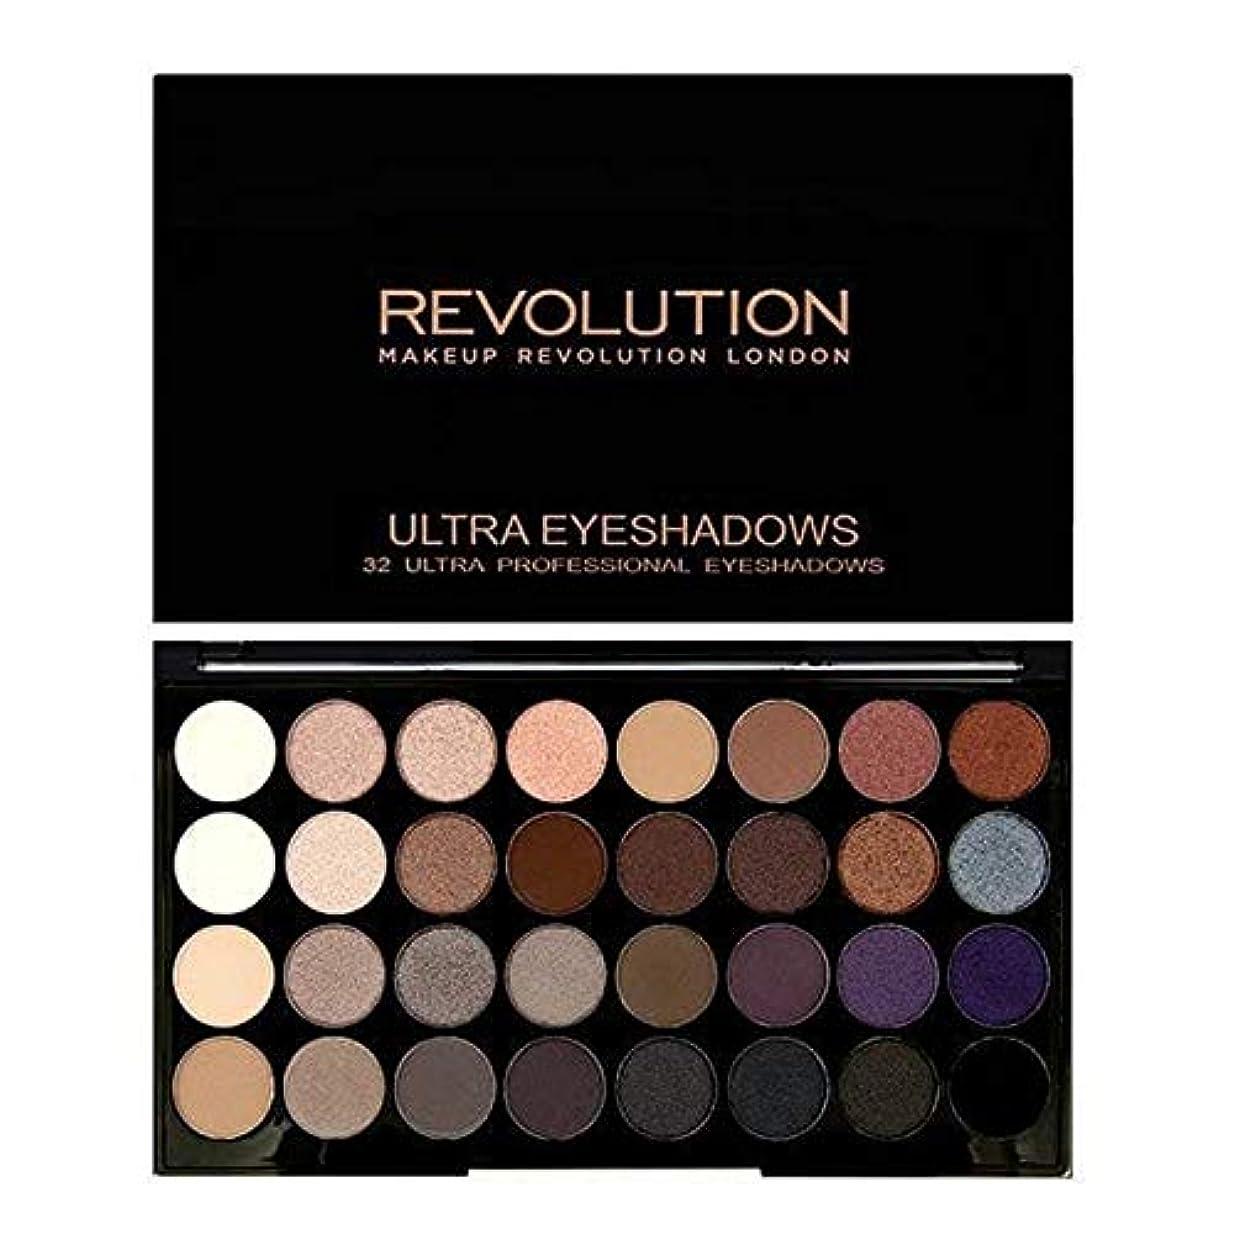 [Revolution ] 革命32アイシャドウパレット肯定 - Revolution 32 Eye Shadow Palette Affirmation [並行輸入品]